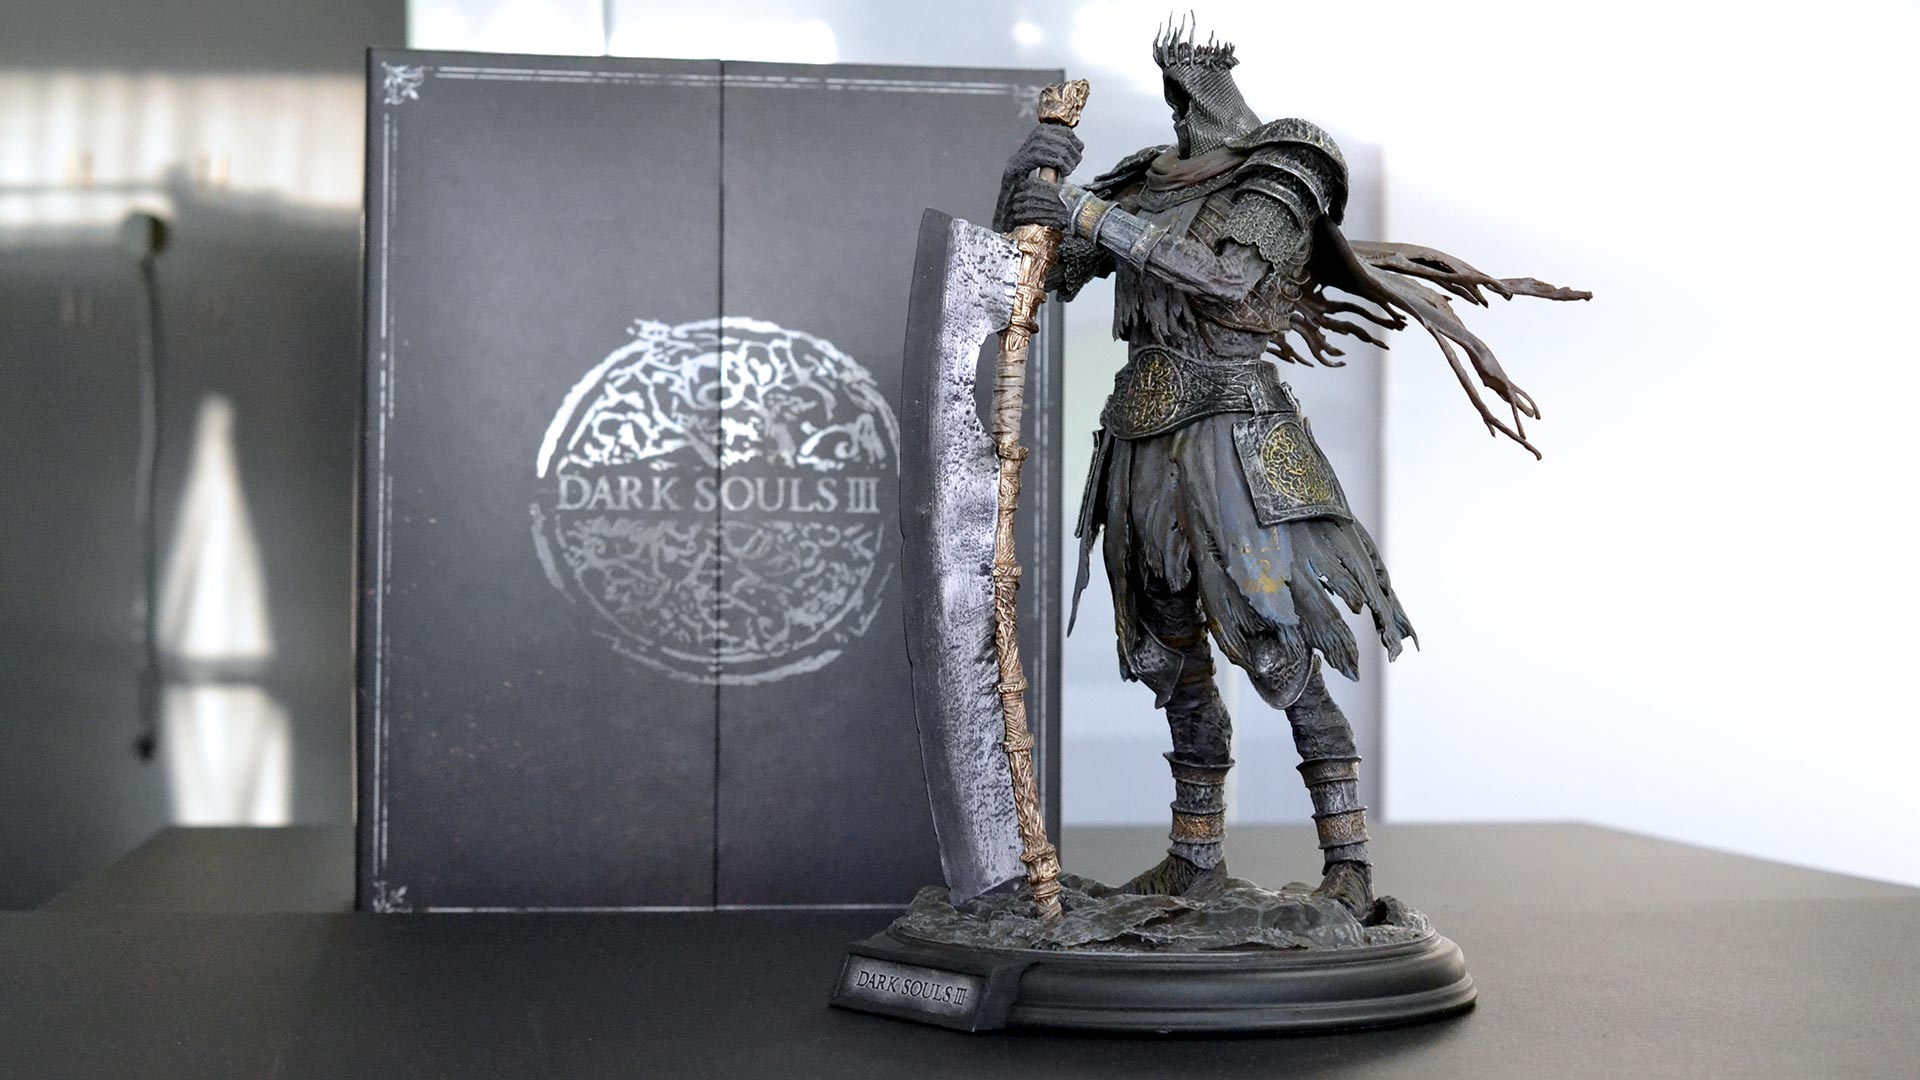 Dark Souls 3 Figurine and box